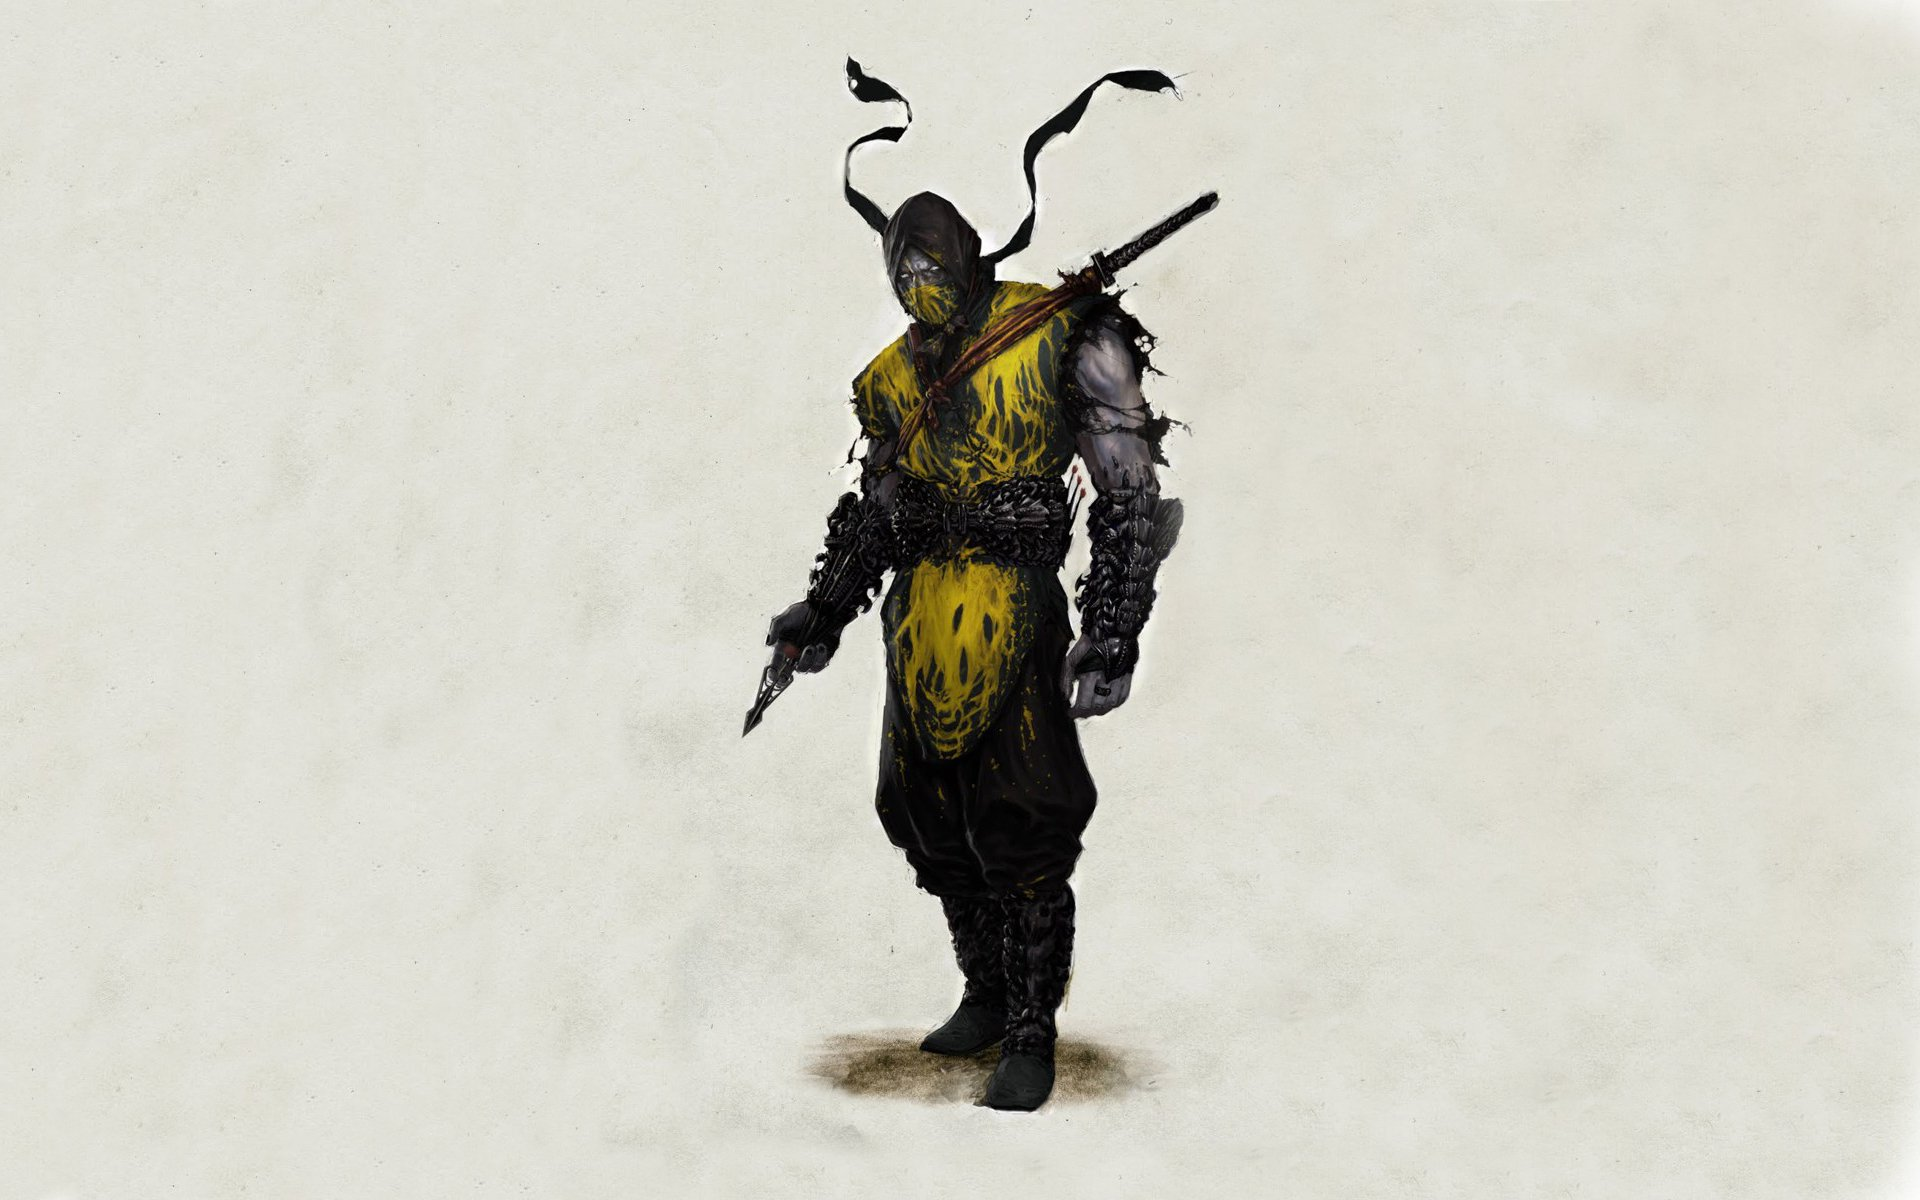 Video Game - Mortal Kombat  Warrior Scorpion (Mortal Kombat) Wallpaper